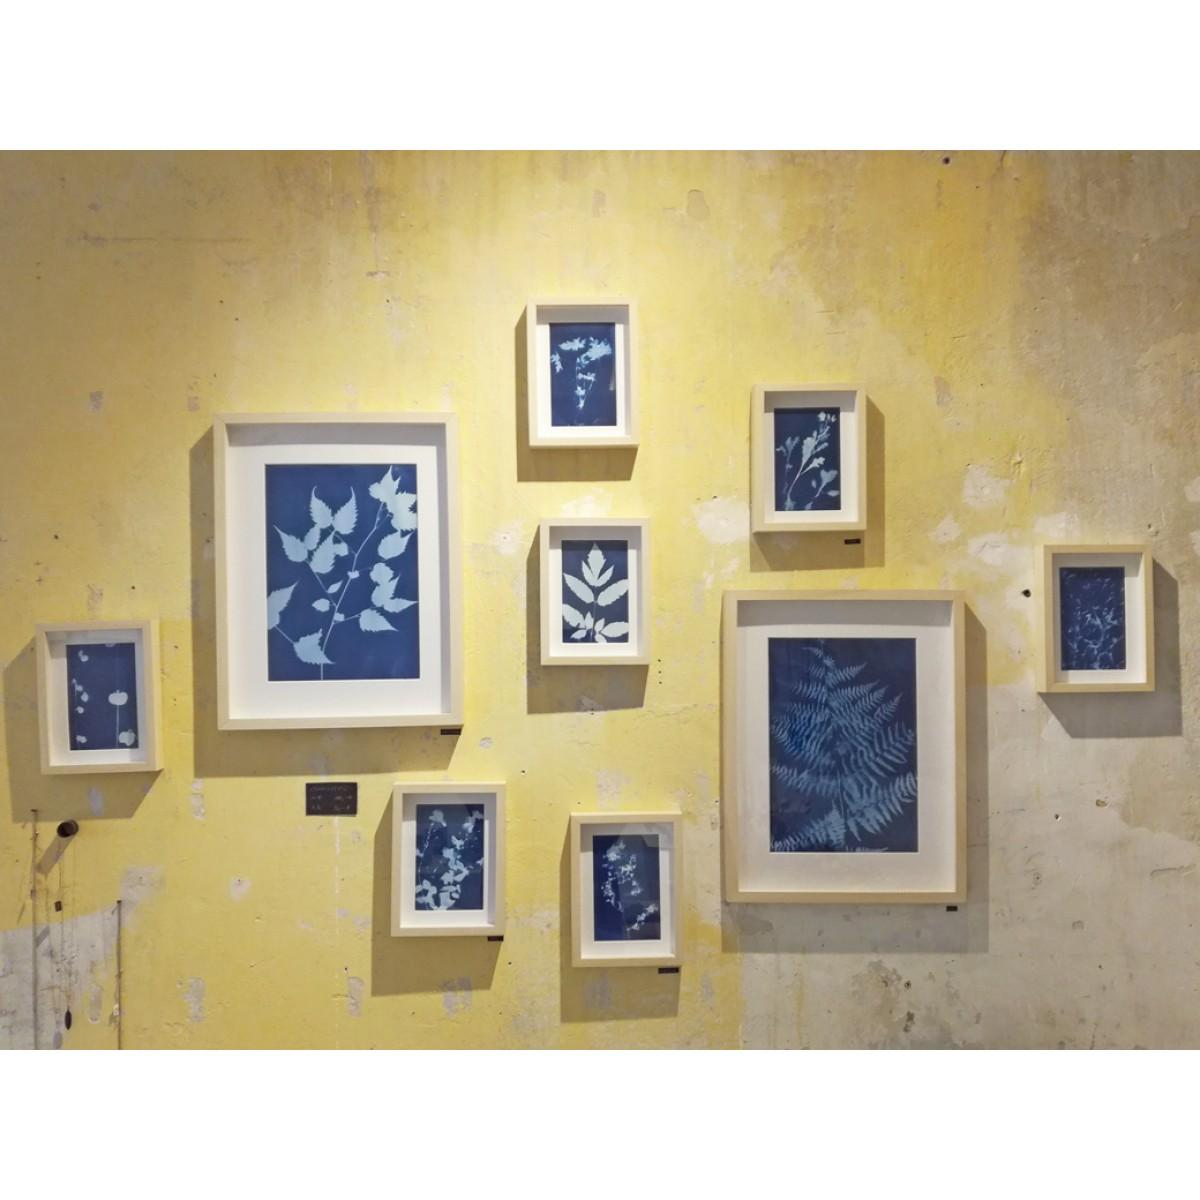 Anka Büchler, Konifere, Blaudruck, Cyanotypie, Unikat, DIN A6, Motiv 6